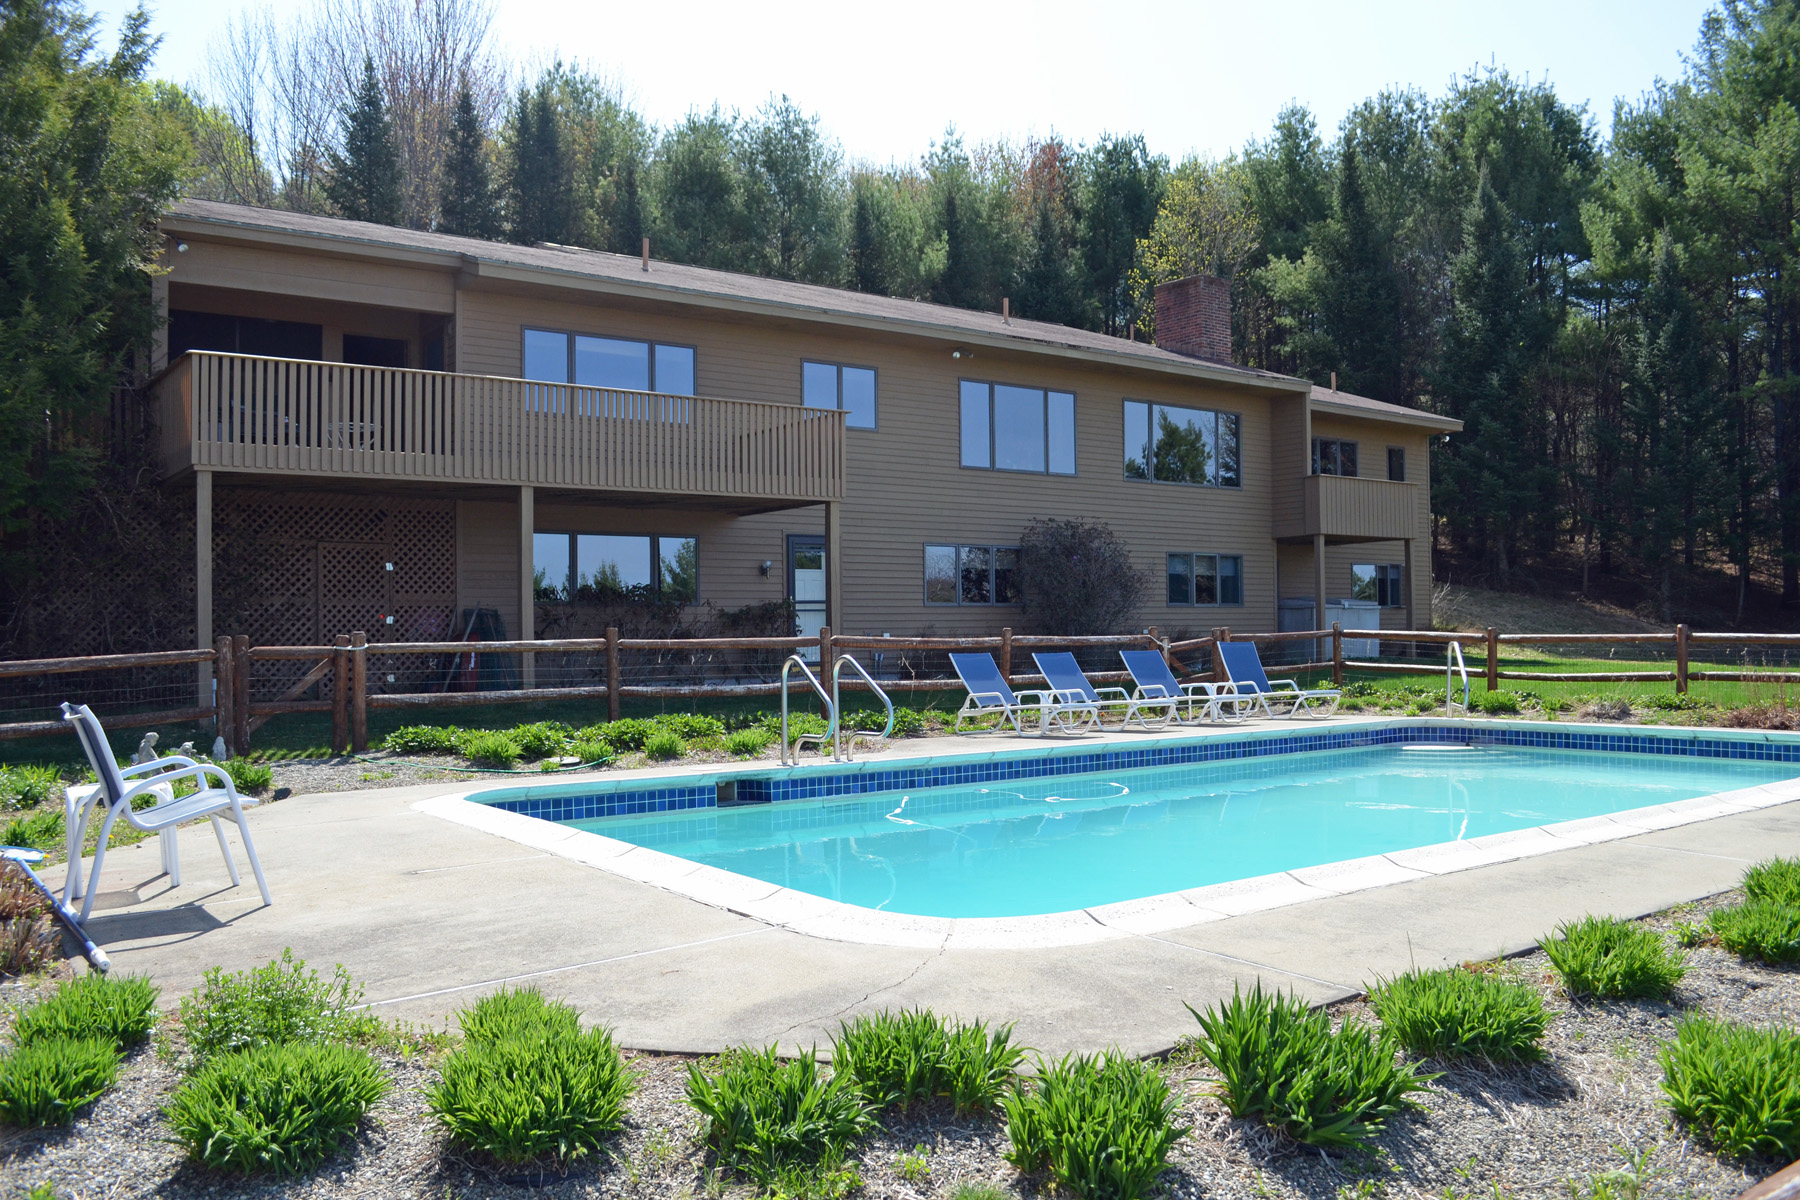 獨棟家庭住宅 為 出售 在 35 Stevens Road, Hanover 35 Stevens Rd Hanover, 新罕布什爾州, 03755 美國